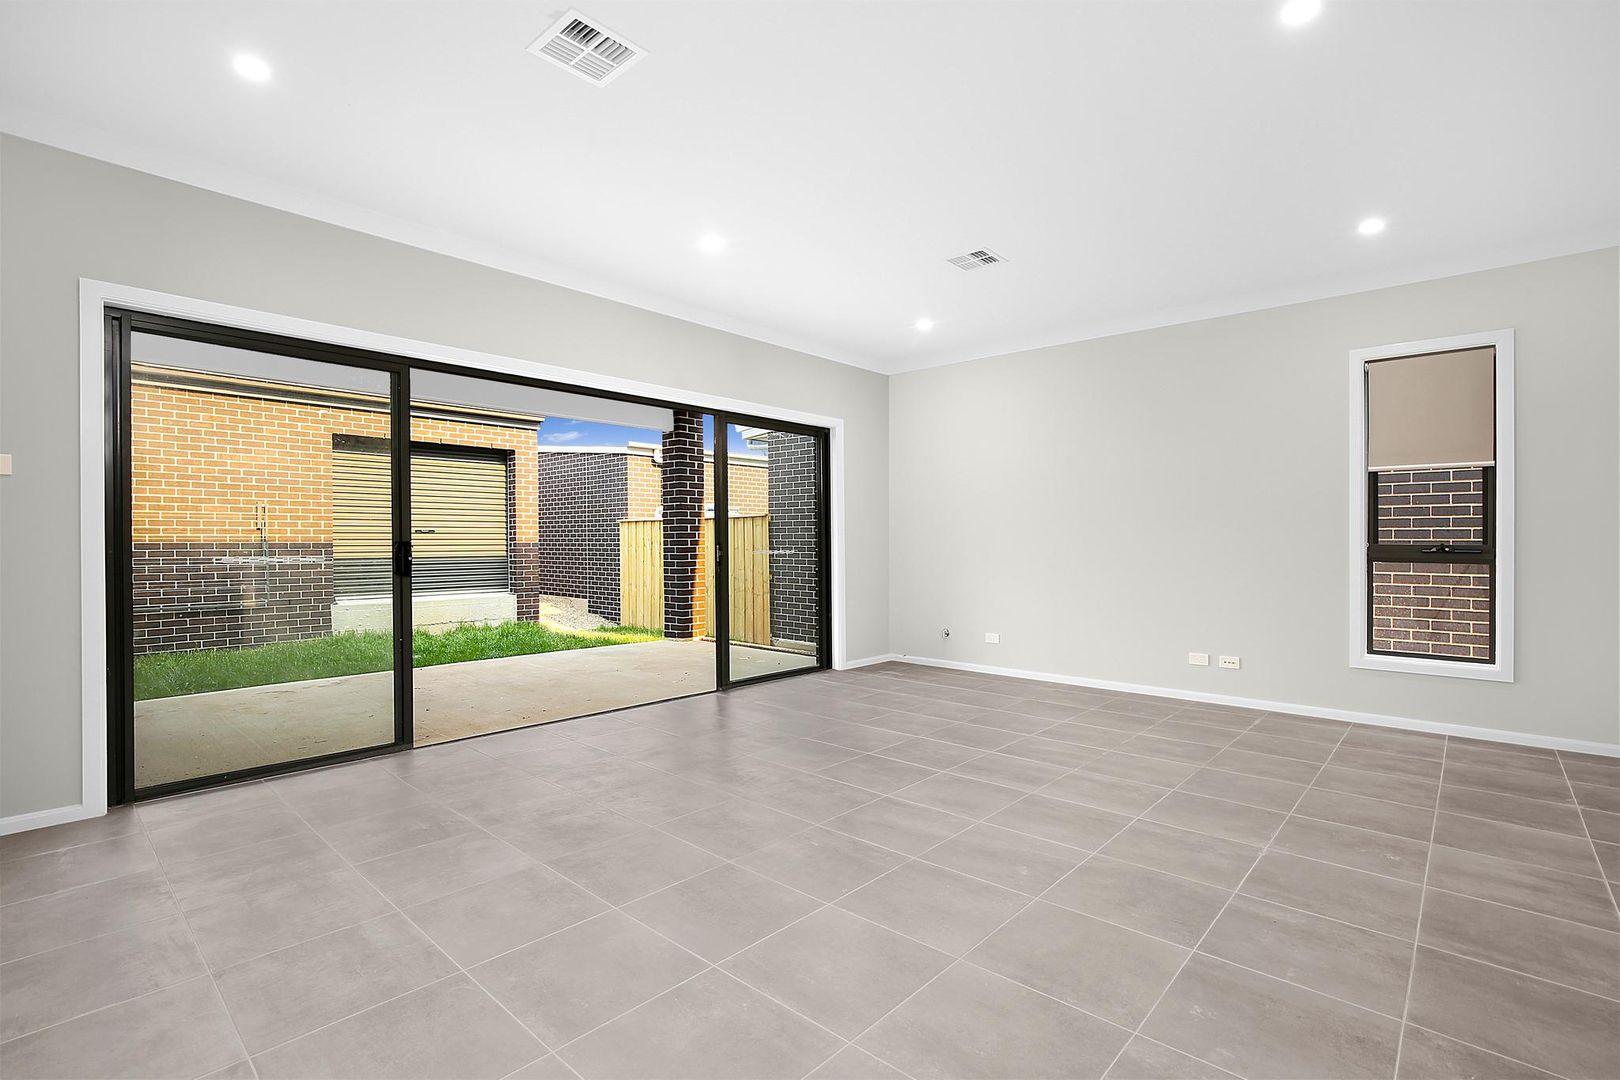 40/Lot 59 Connemara Street, Austral NSW 2179, Image 2